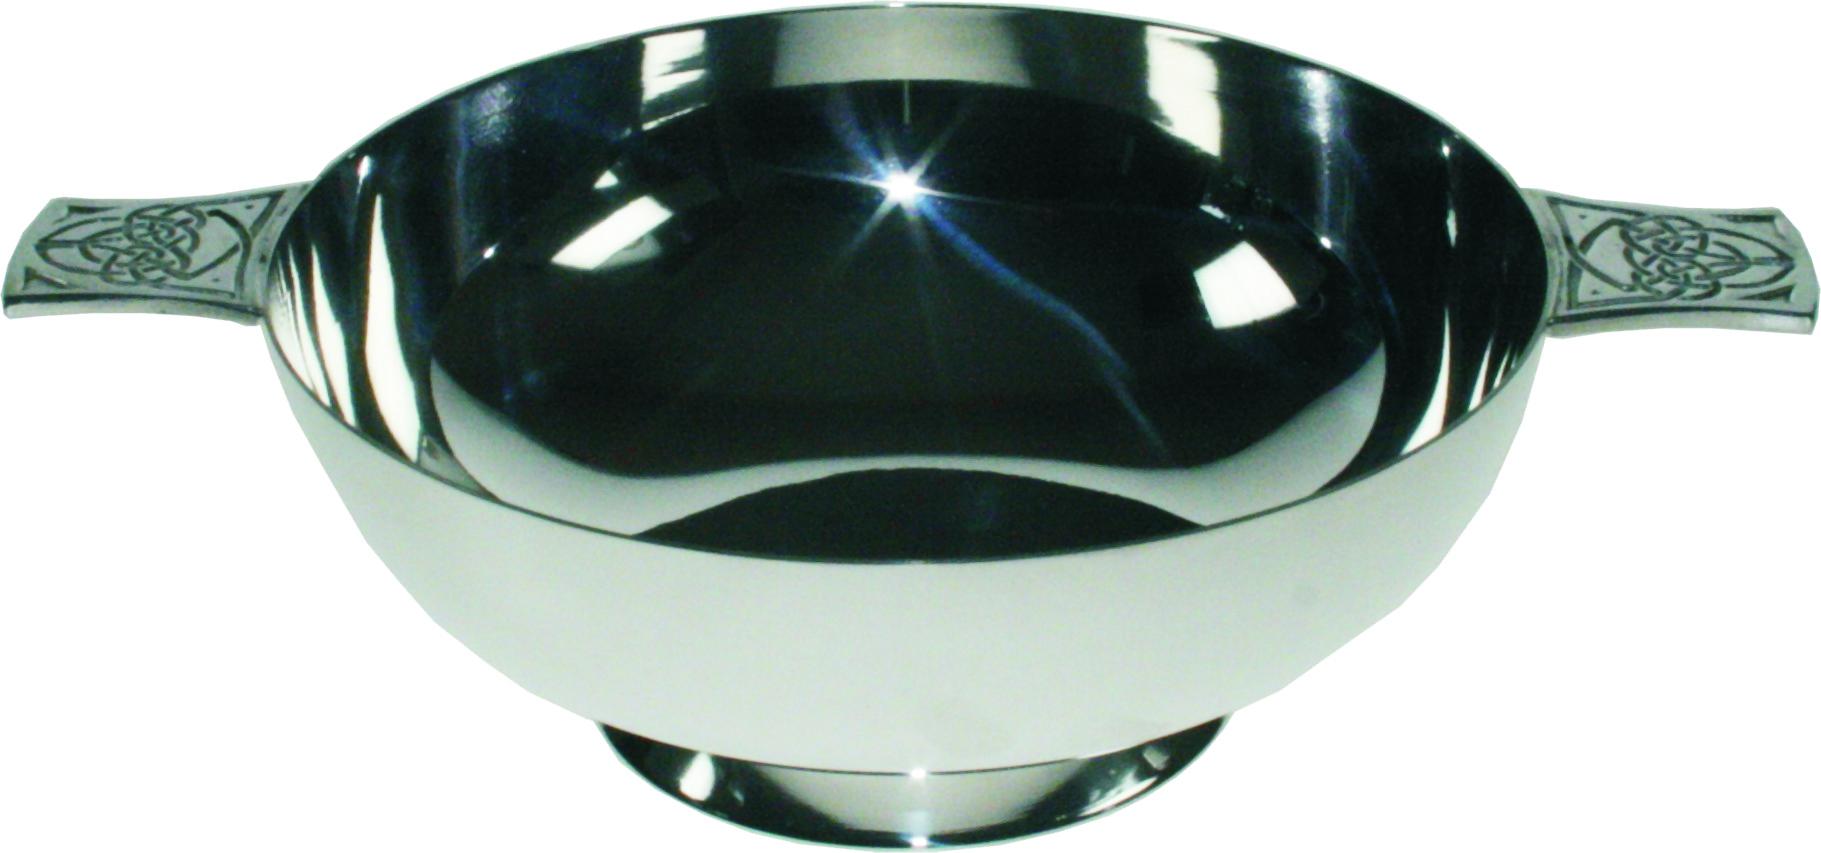 "Spun Silver Plated Quaich Bowl Celtic Detailed Handles 15.5cm (6"")"